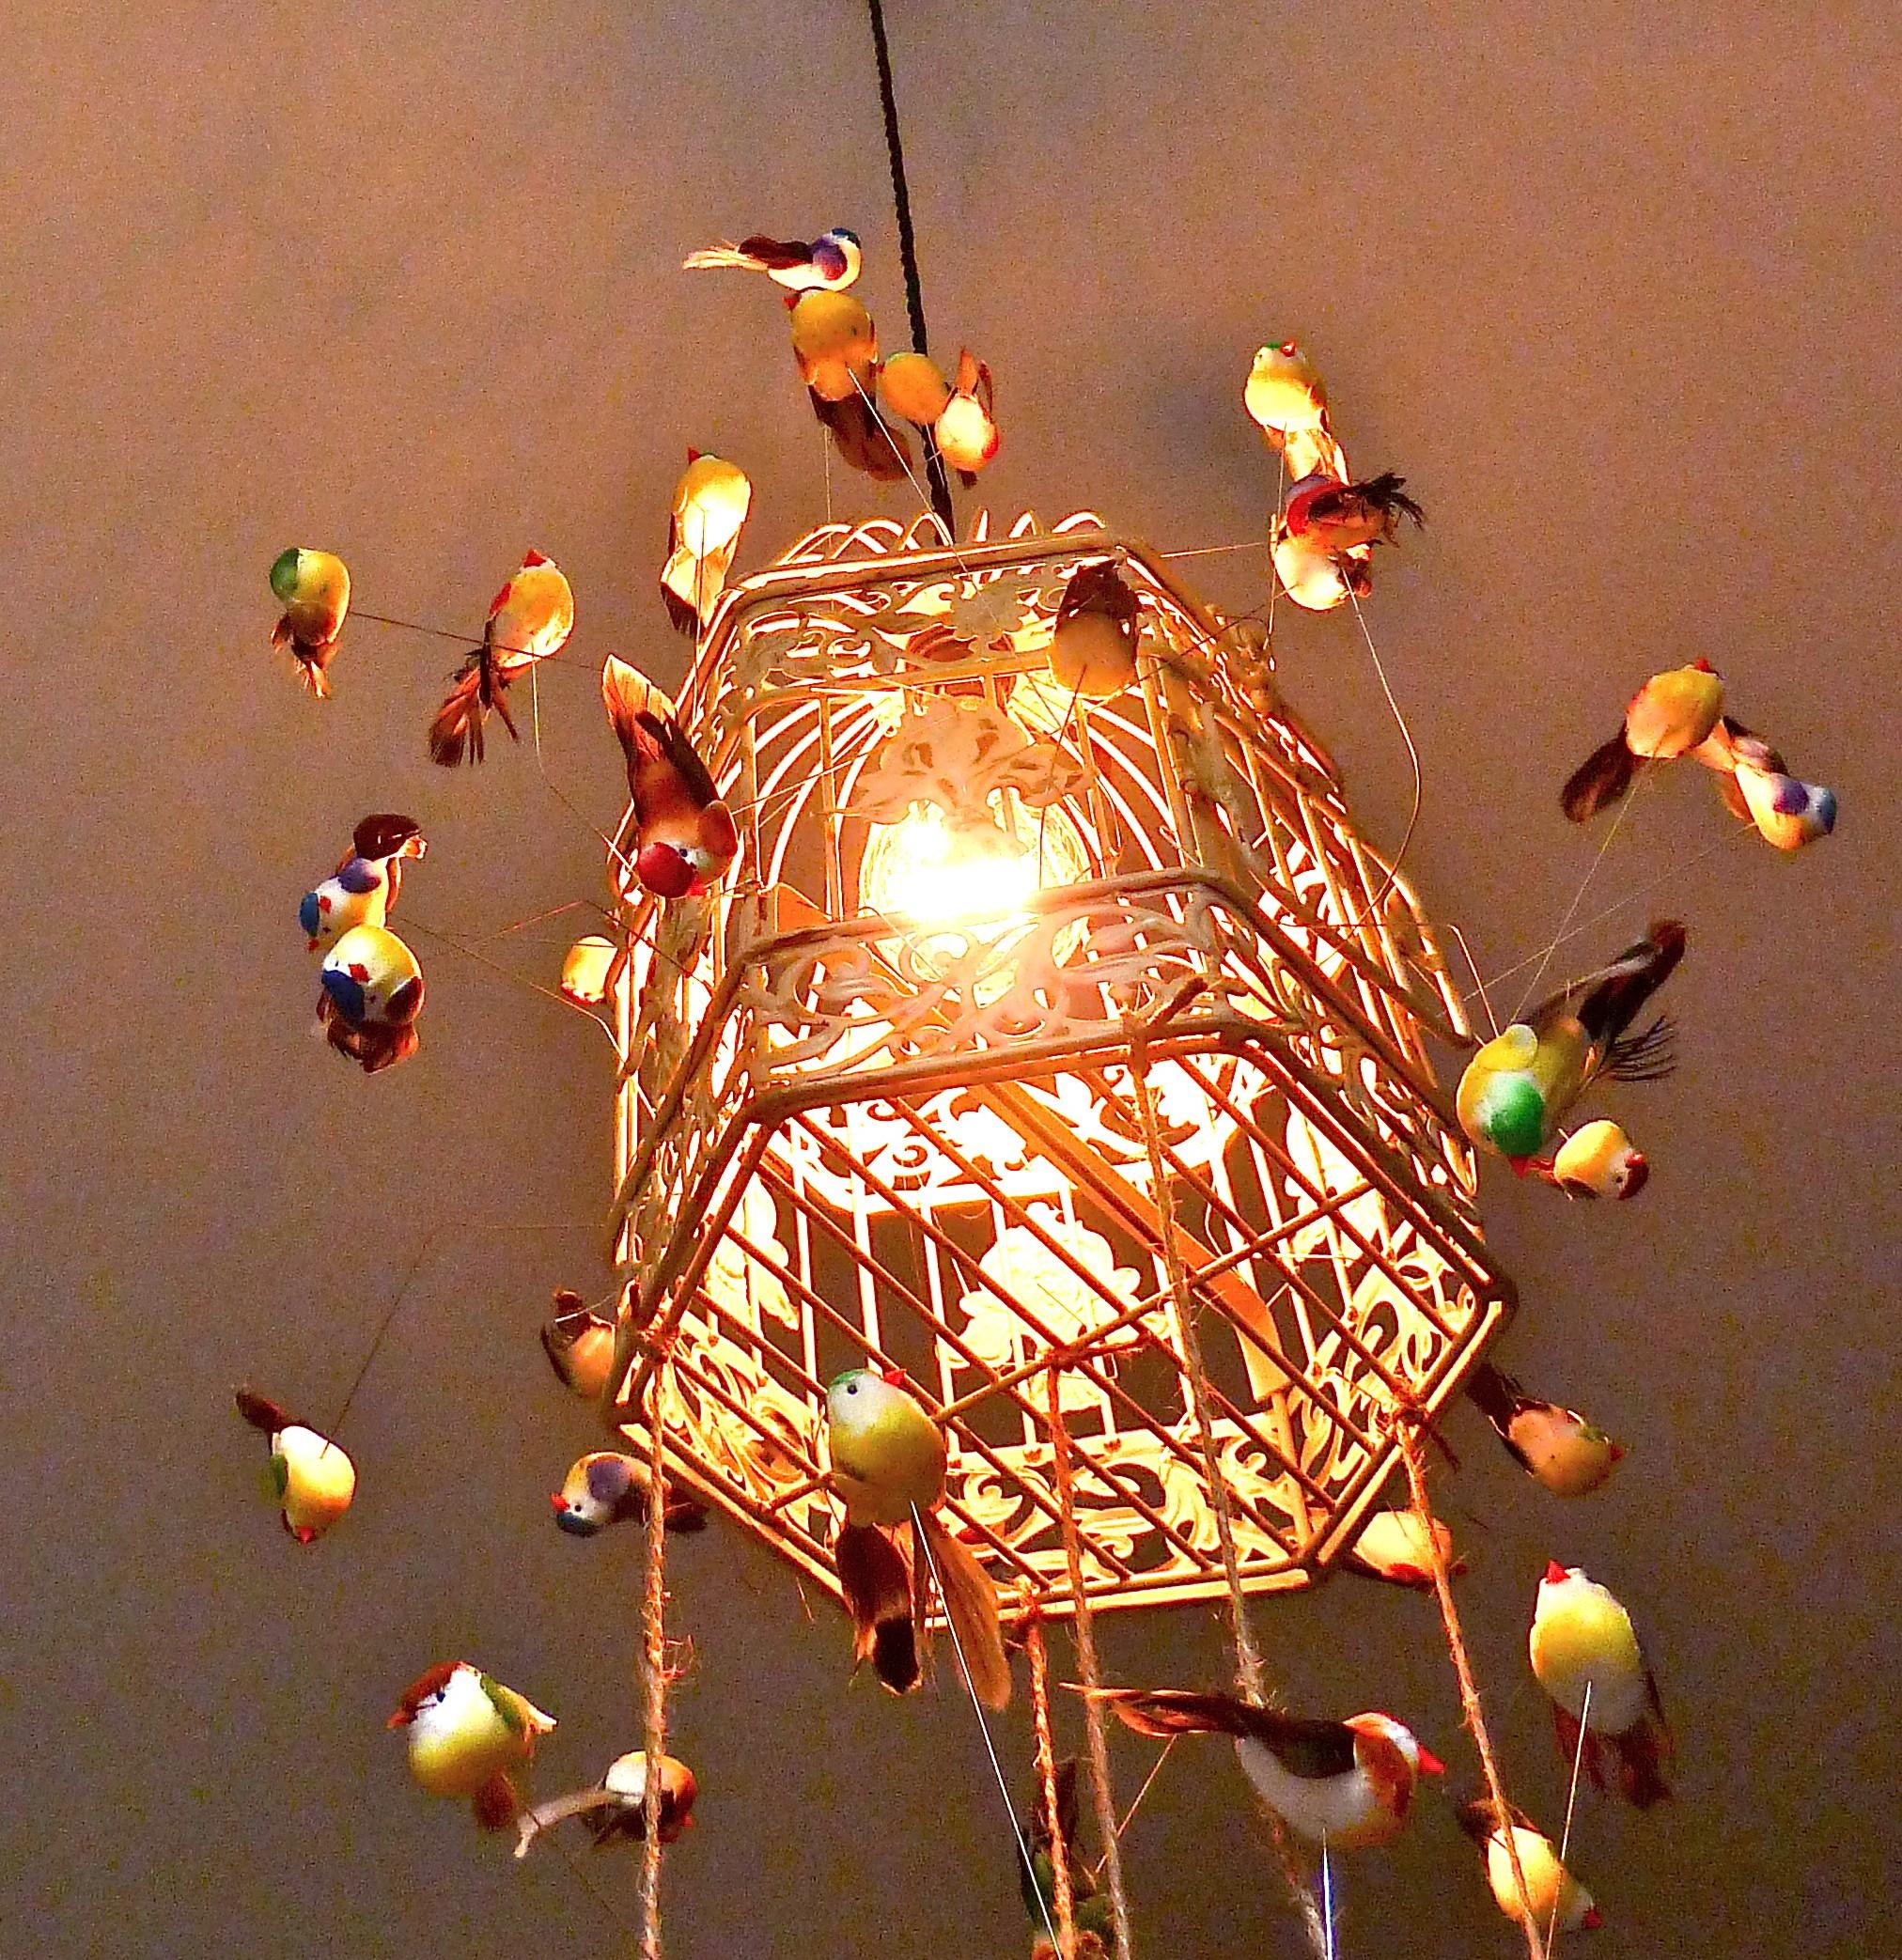 sold cherub of lamp ideas gim in table floor lighting luxury brass coach vintage inspirational birdcage